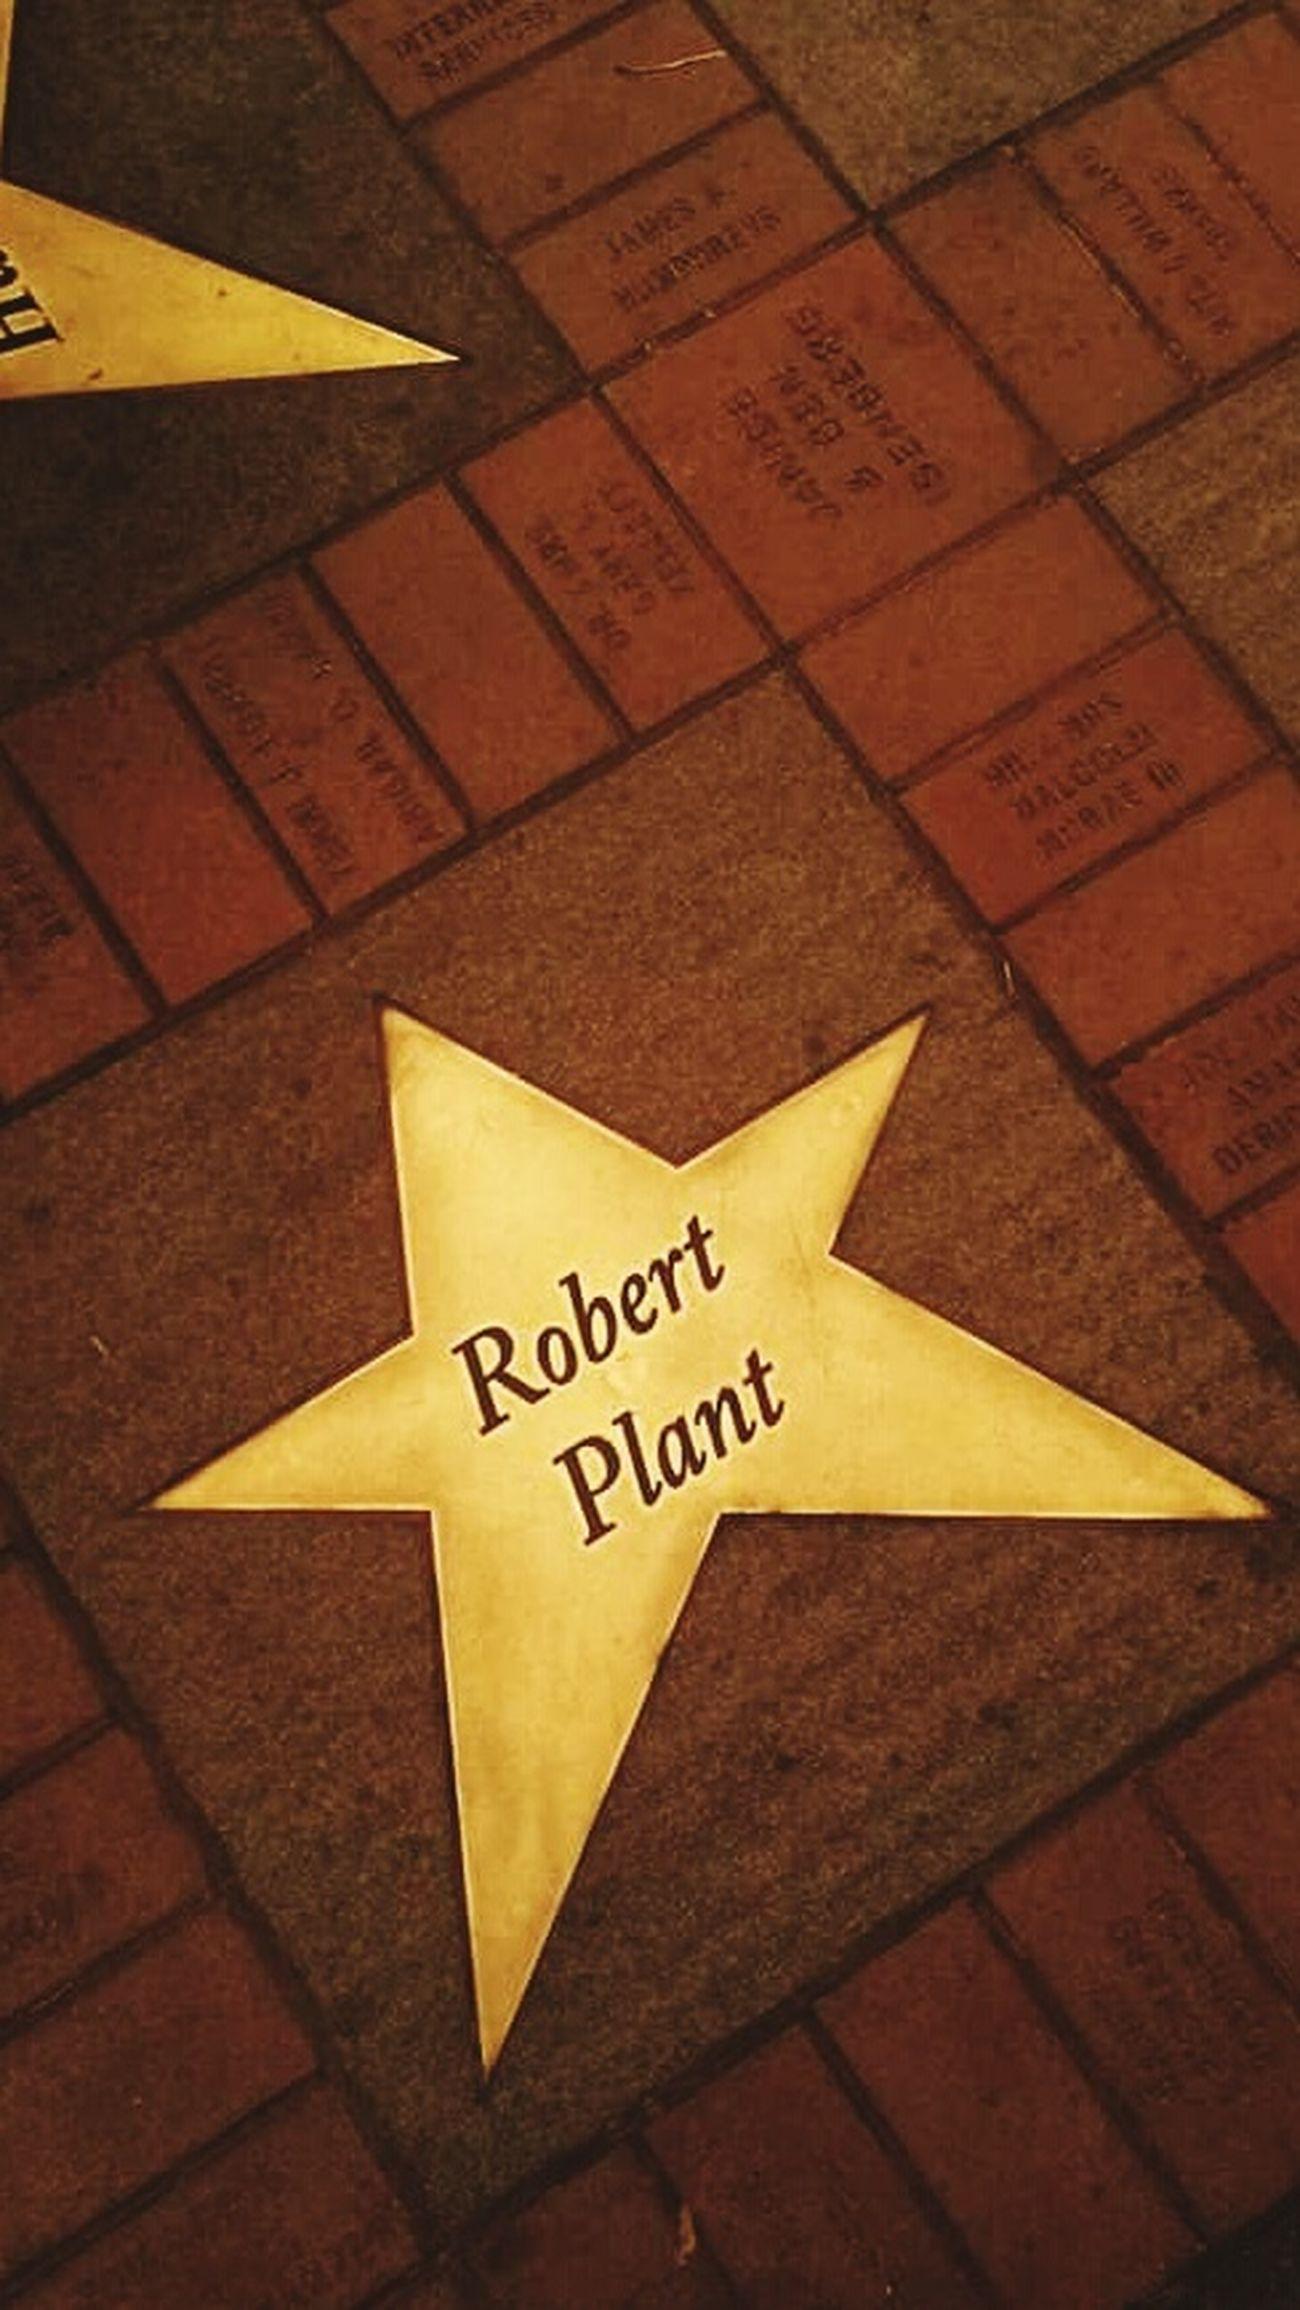 Downtown Memphis Robertplant LedZep Star